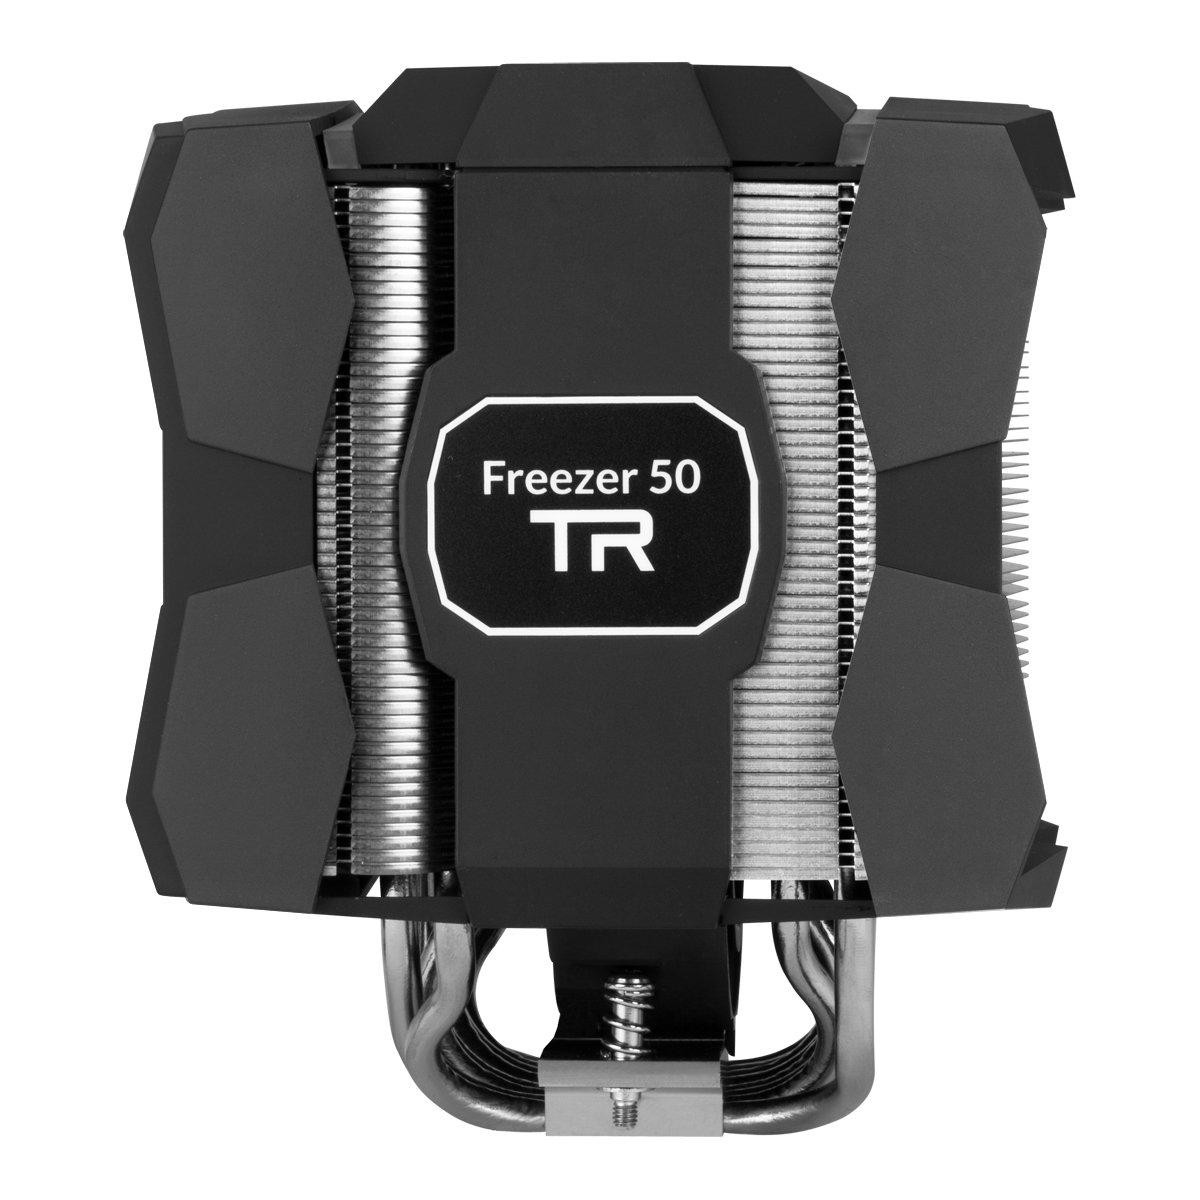 Freezer 50 TR G051